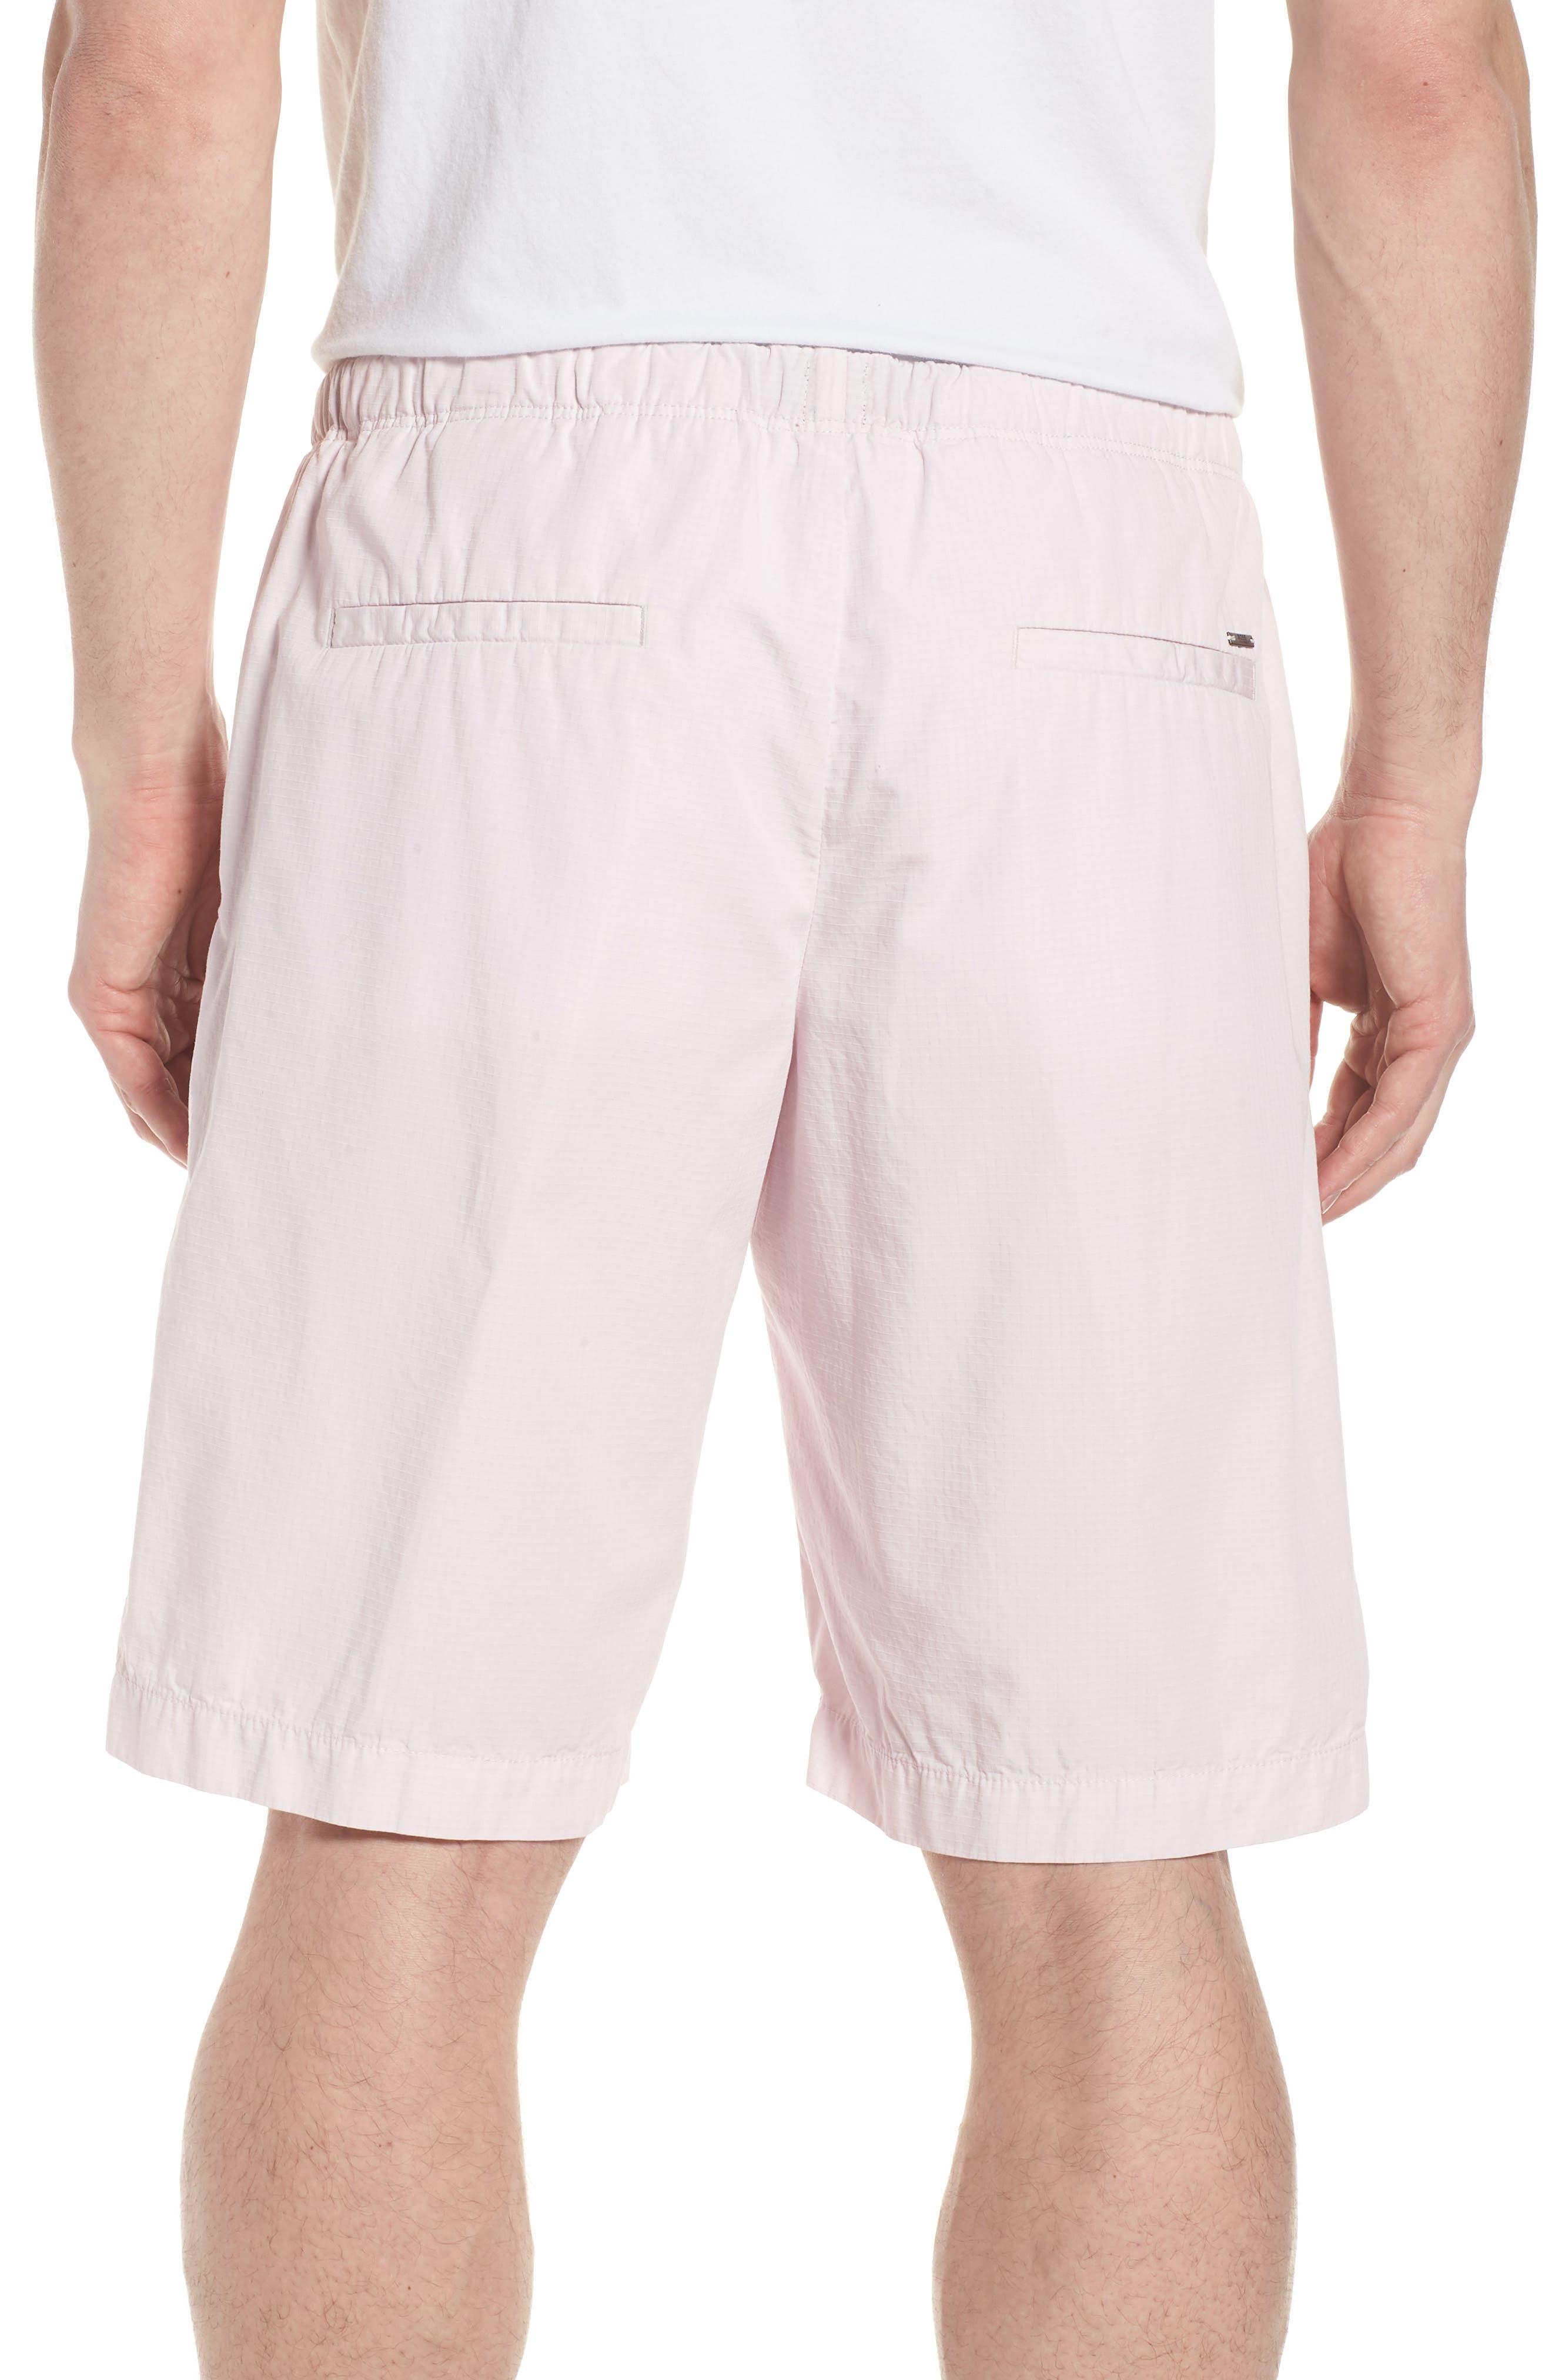 Passeo Cotton Shorts,                             Alternate thumbnail 2, color,                             Pink